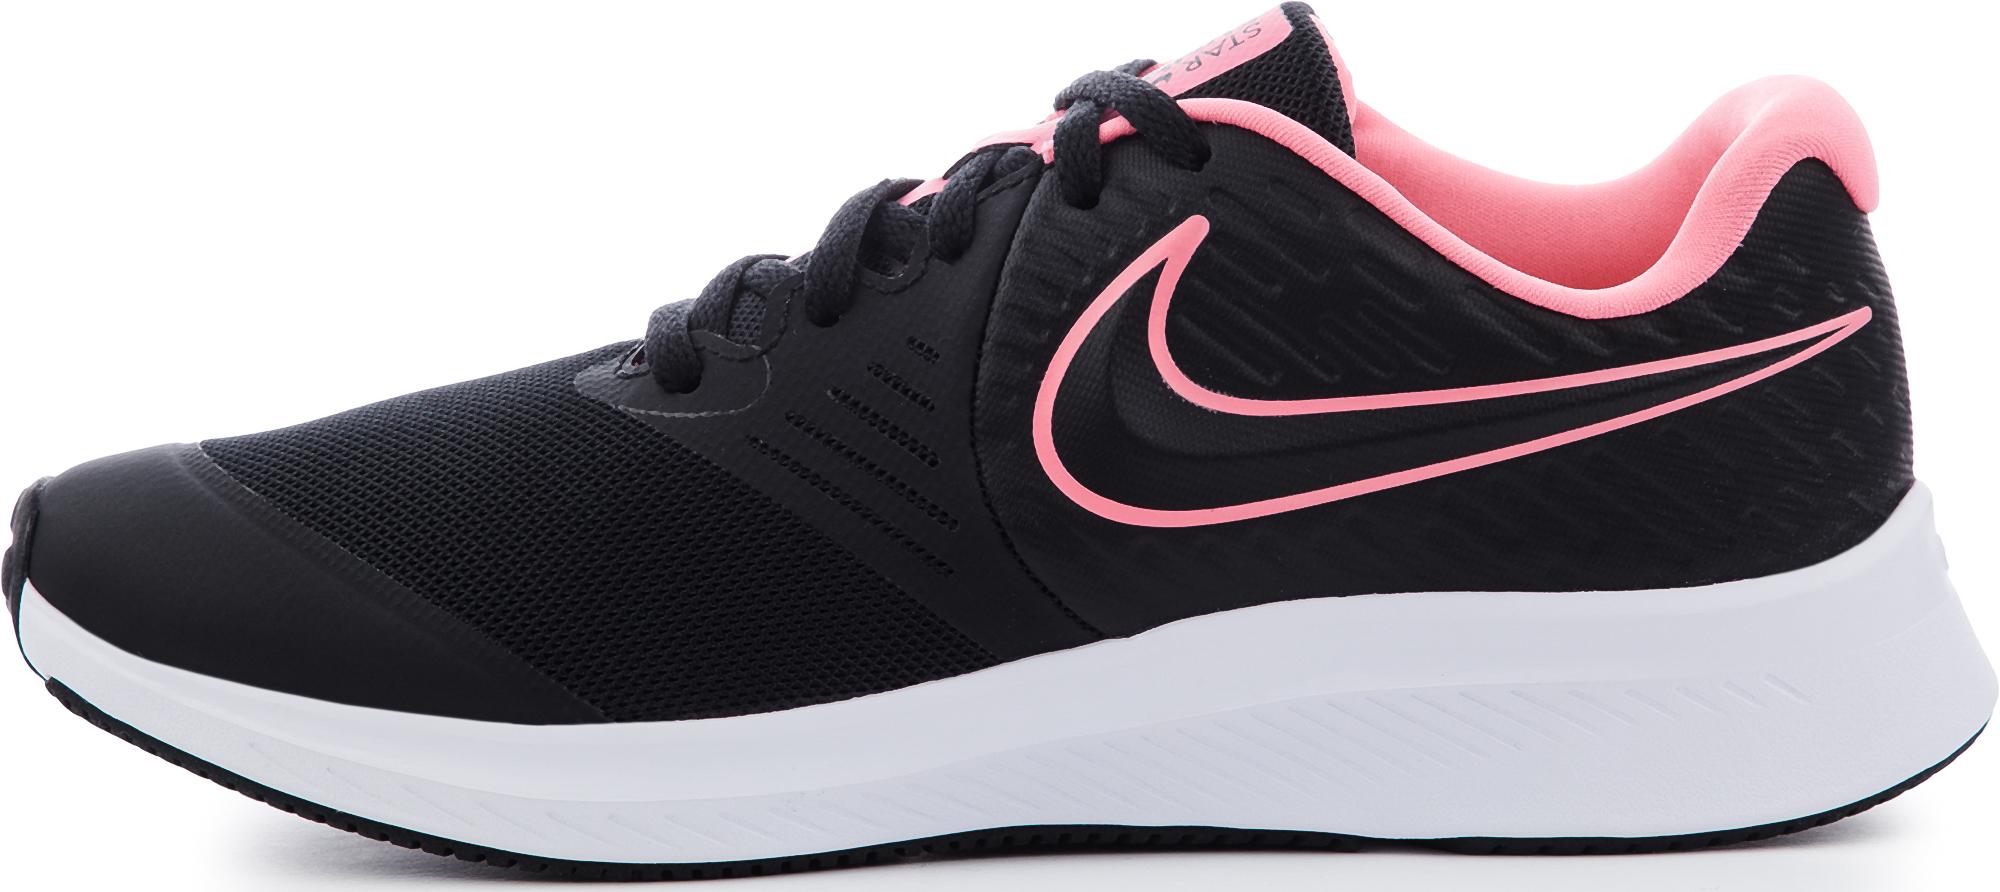 Nike Кроссовки для девочек Nike Star Runner 2 (Gs), размер 37 кроссовки double star ds635